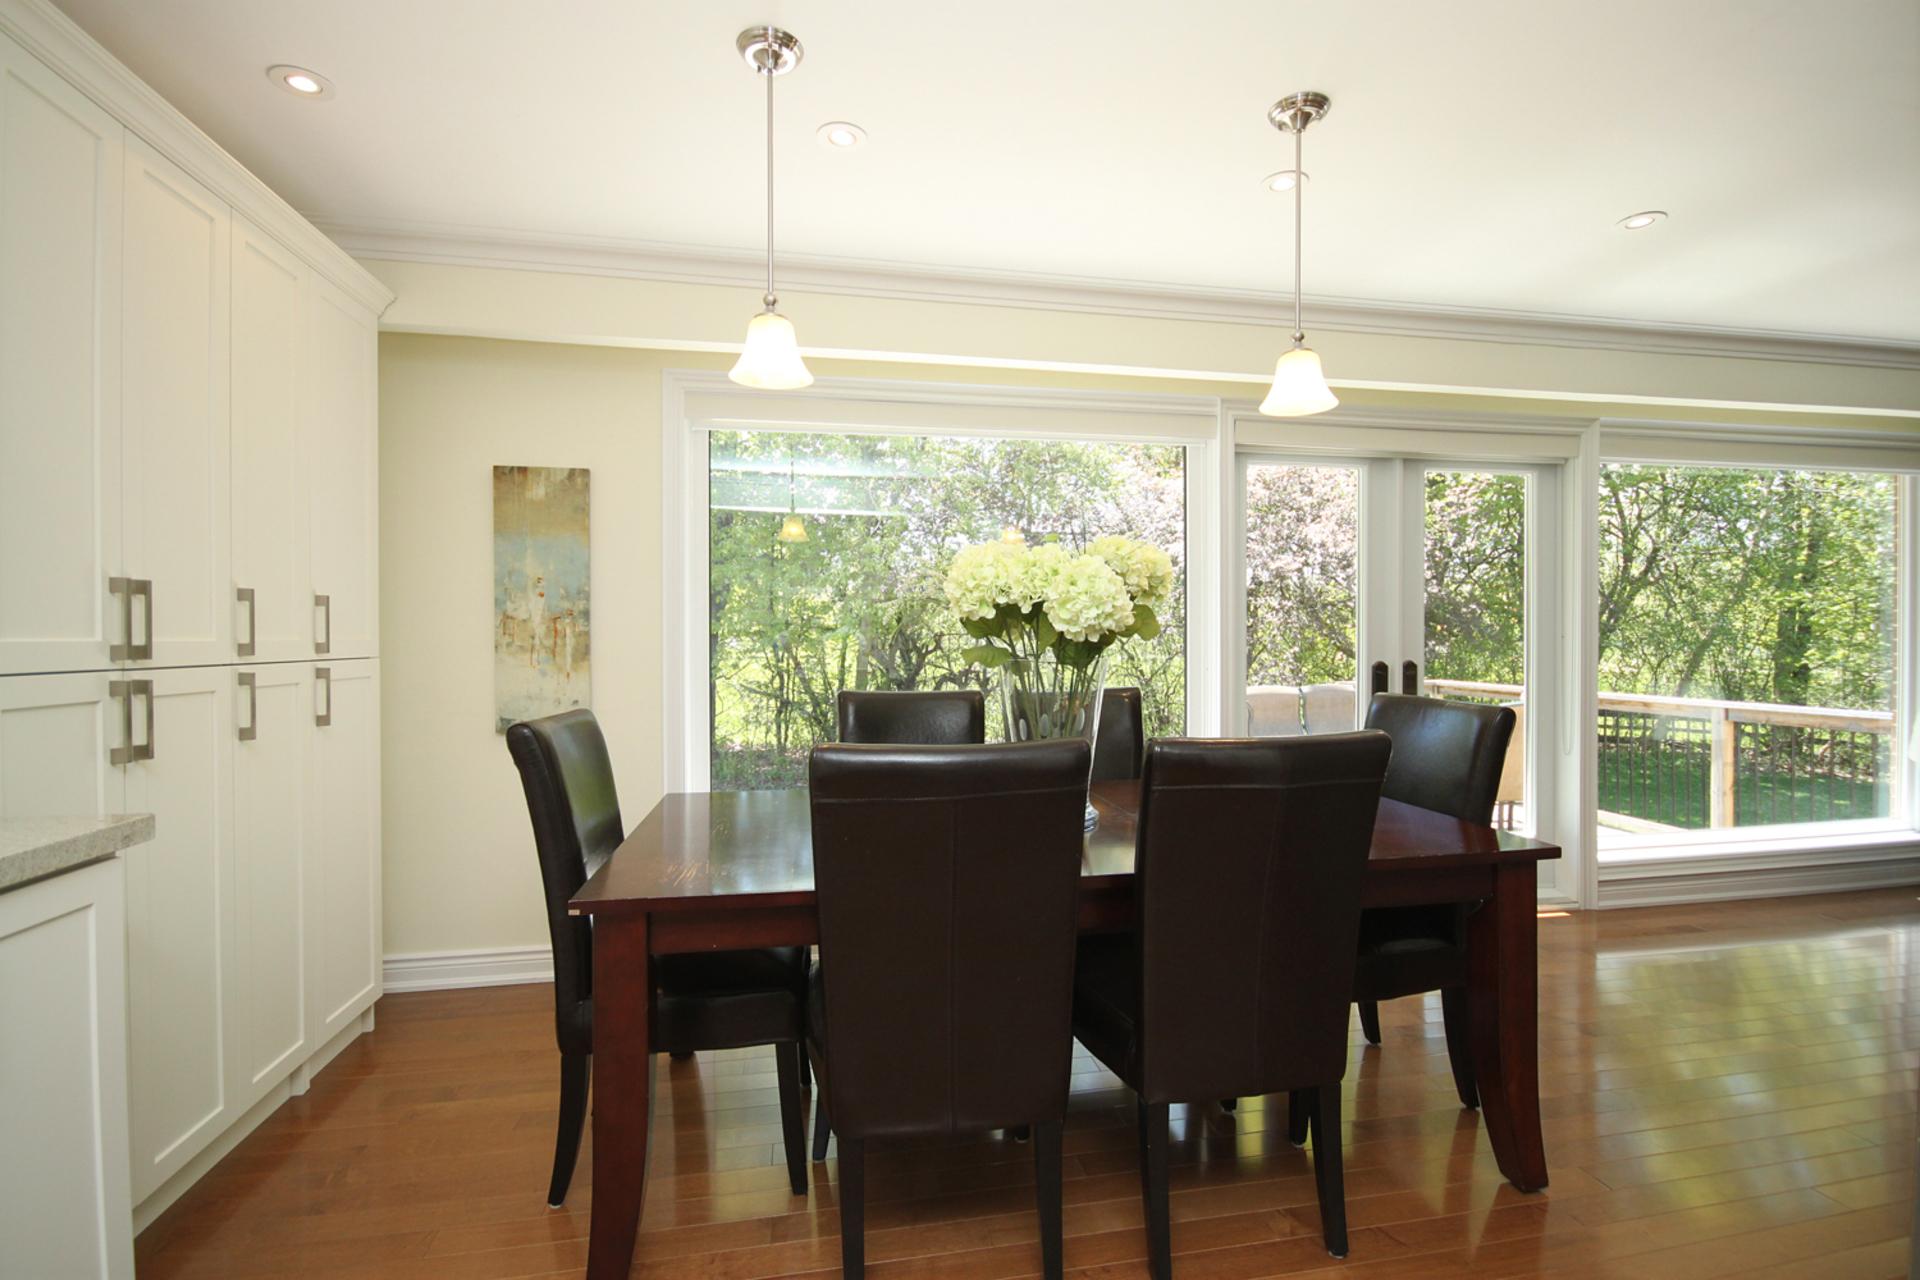 Kitchen at 5 Minorca Place, Parkwoods-Donalda, Toronto